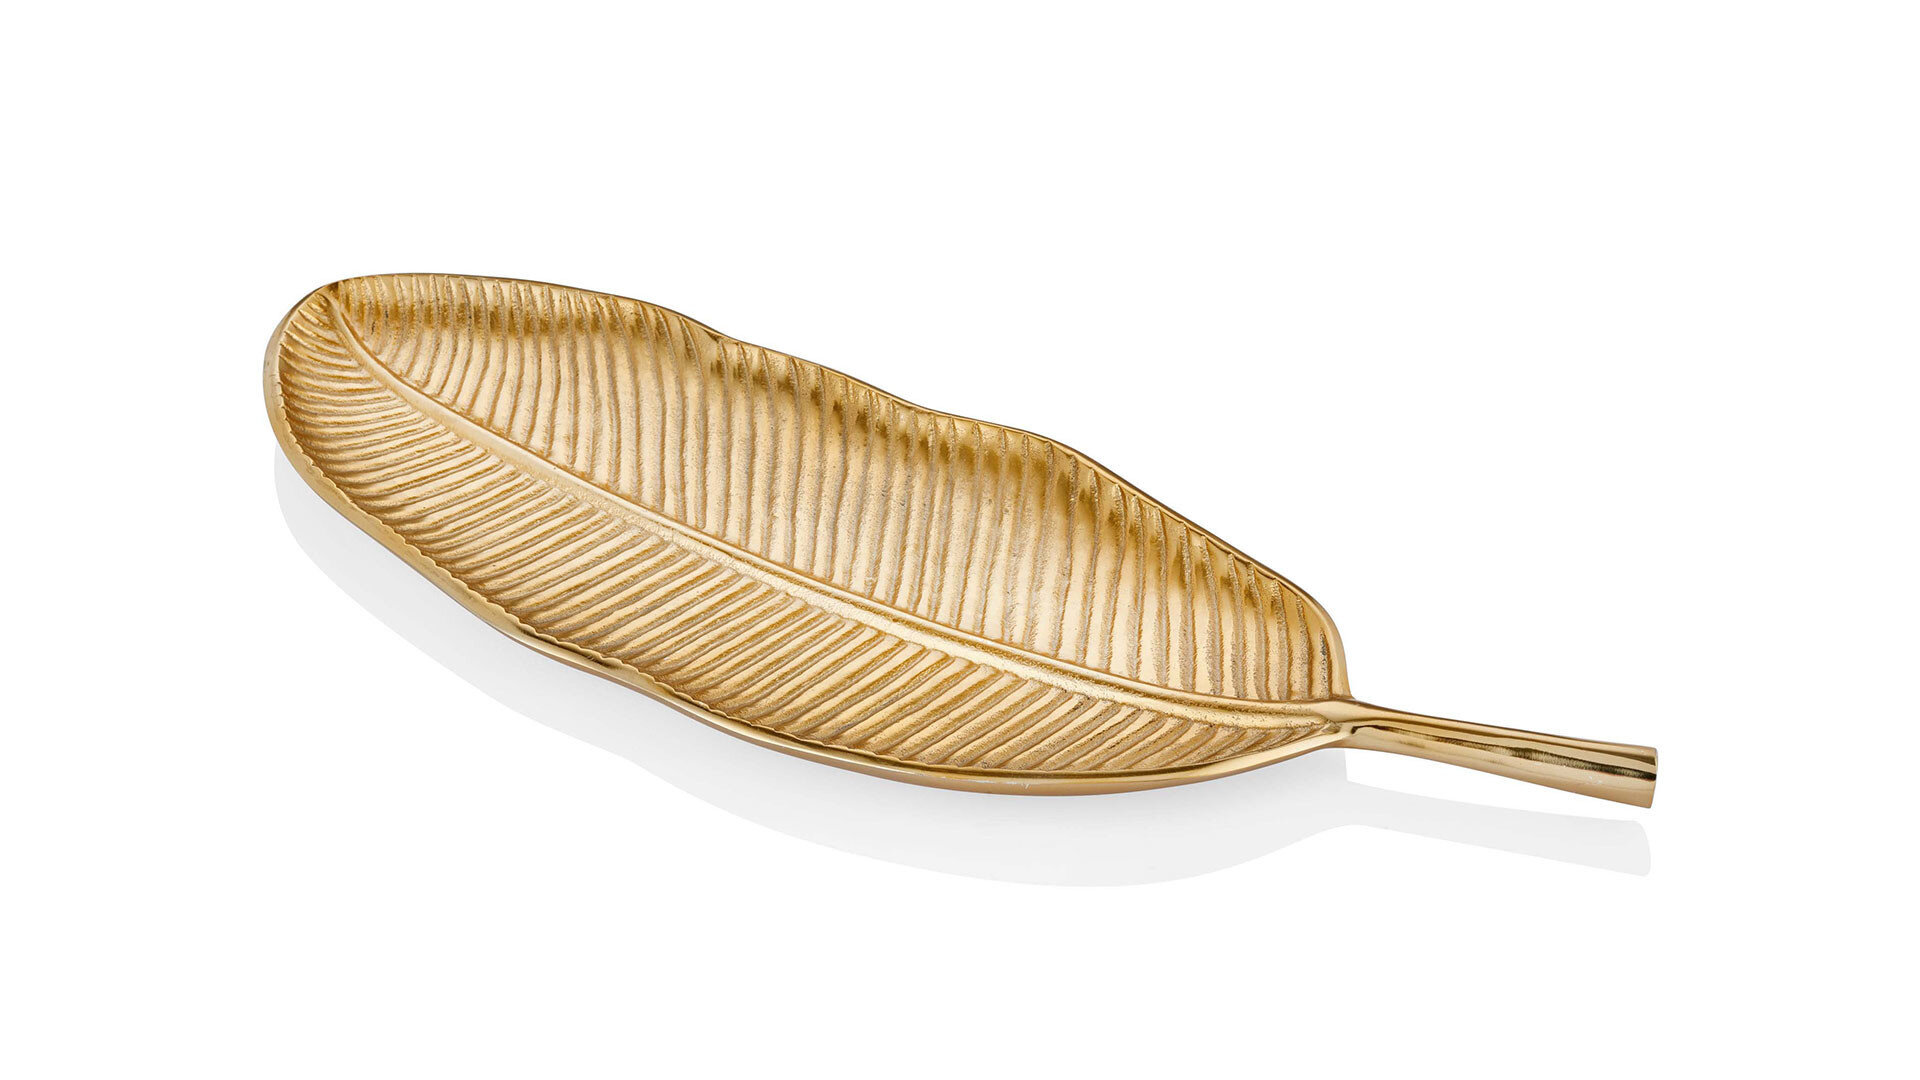 Diamond Sehpa Dekoru Pirinç Yaprak Büyük